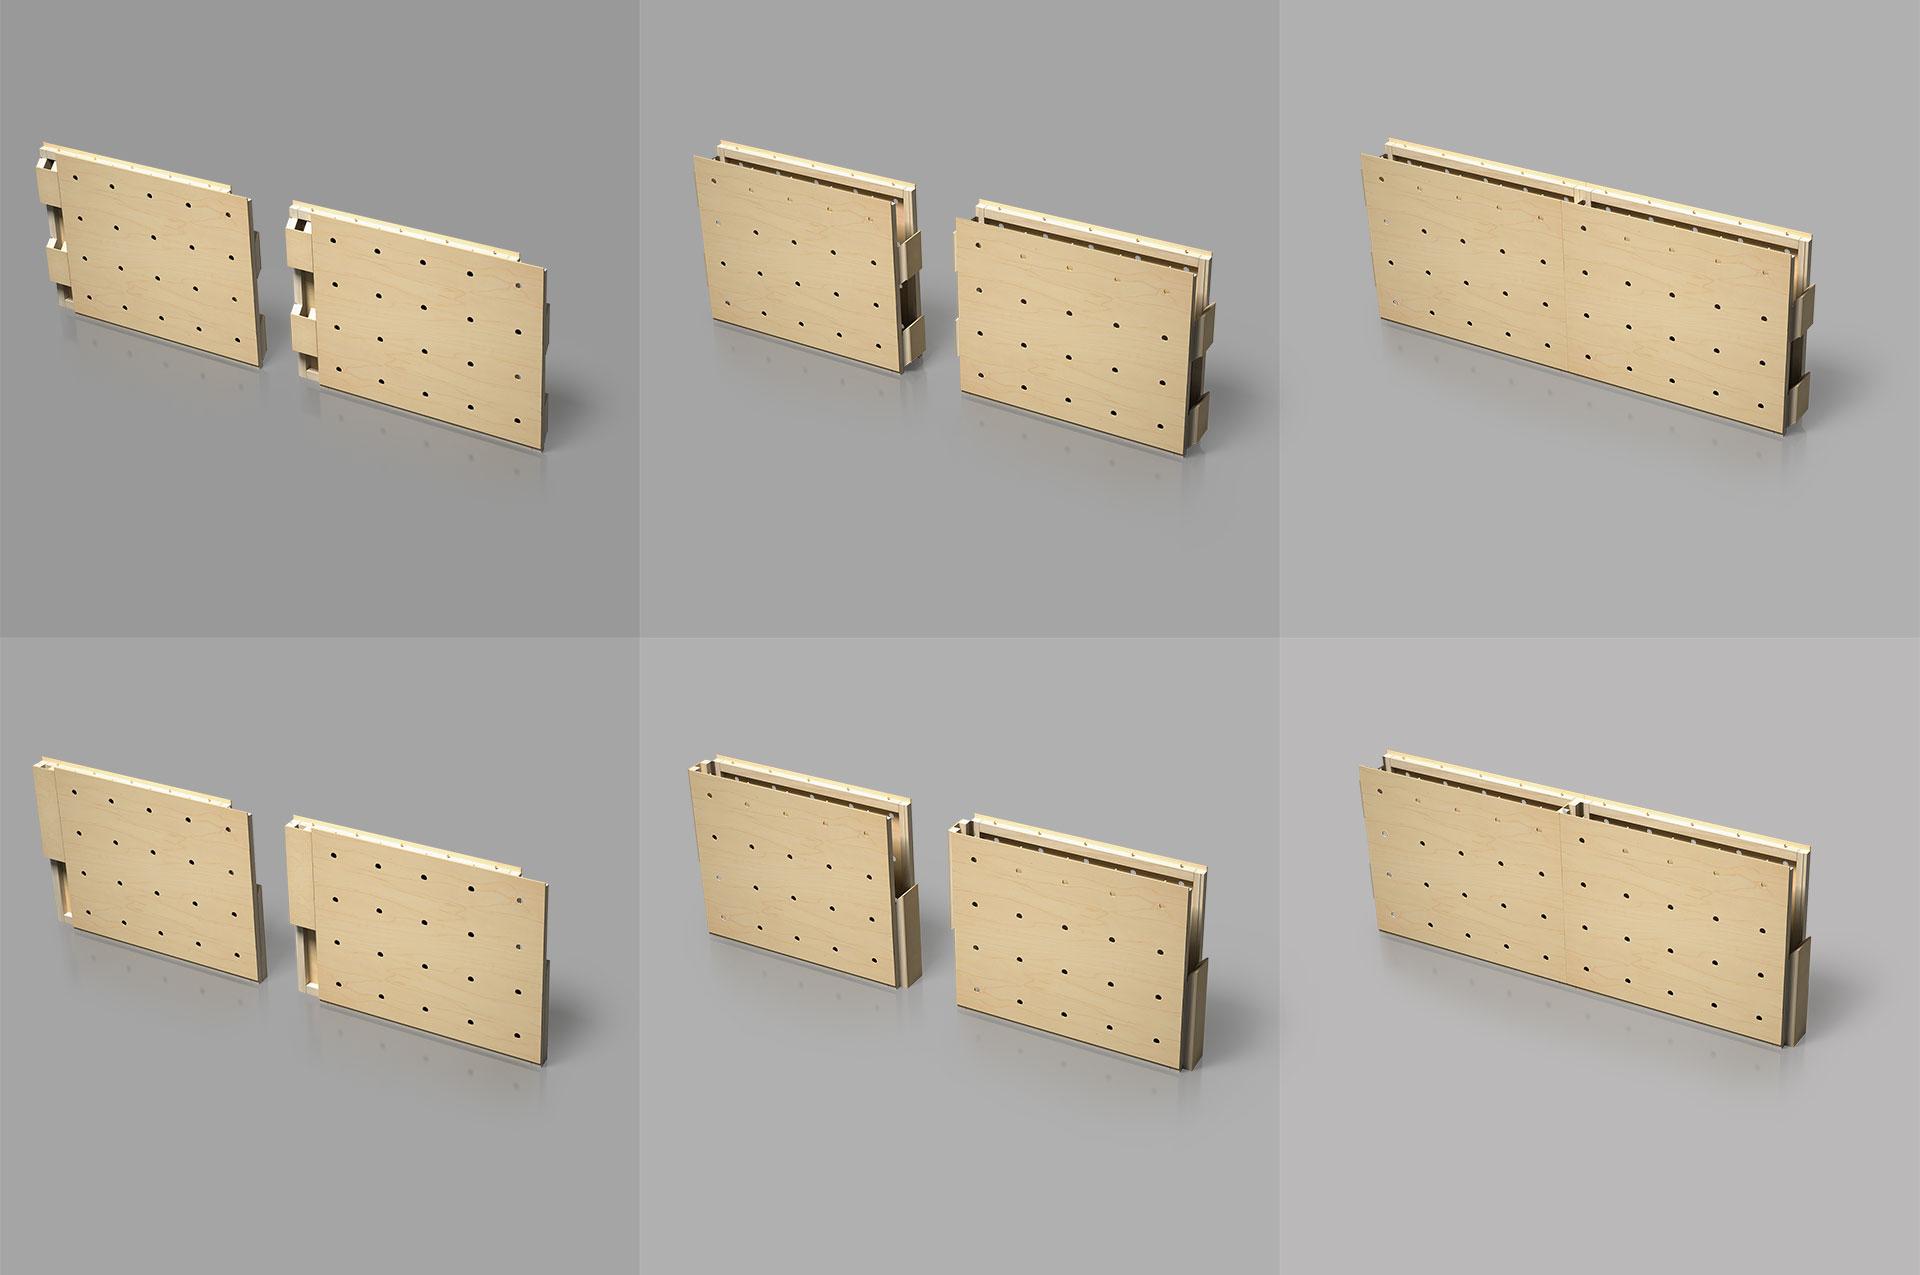 WallStack modular wall system principle